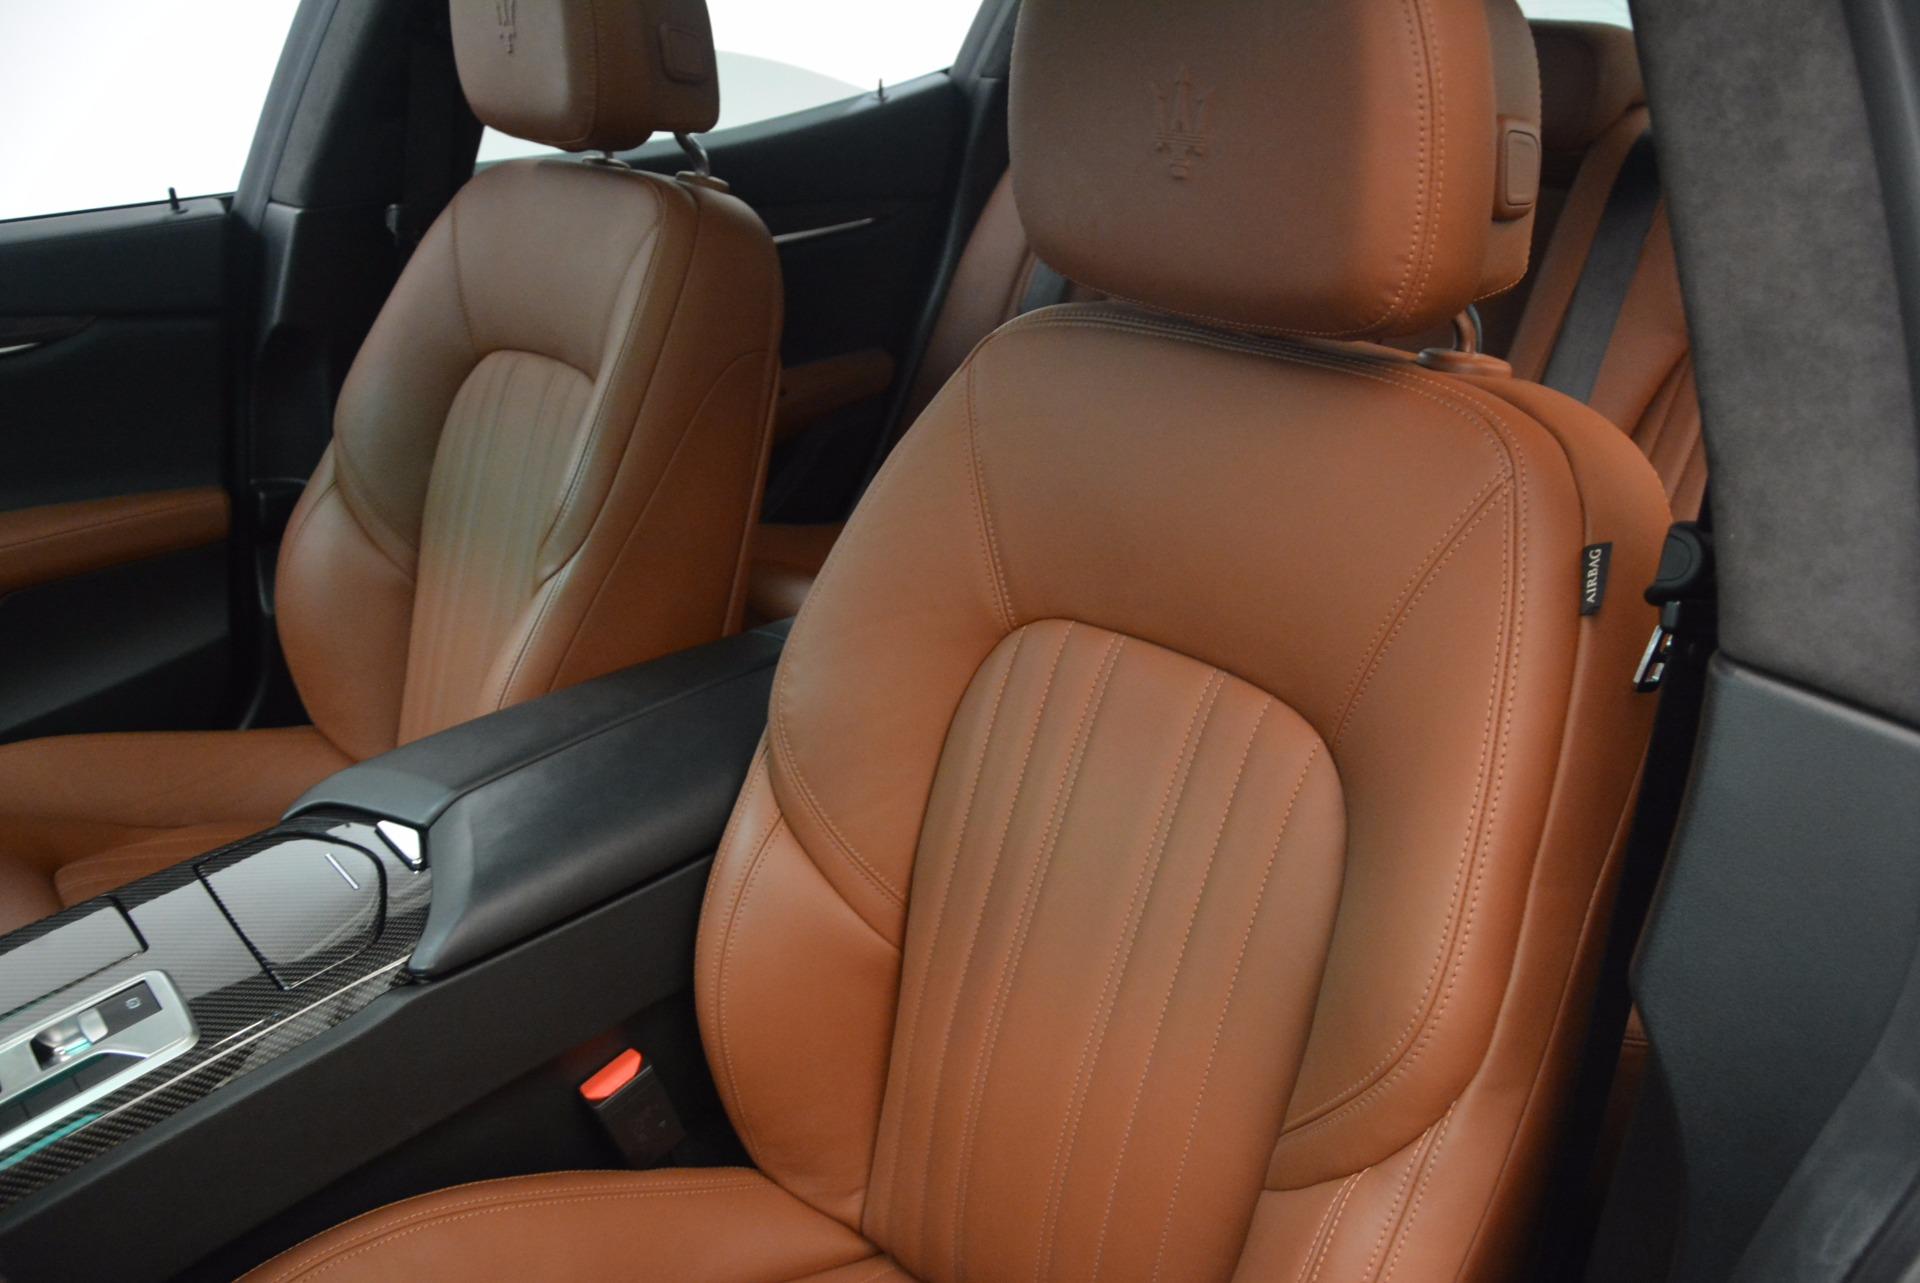 Used 2014 Maserati Ghibli S Q4 For Sale In Greenwich, CT. Alfa Romeo of Greenwich, 7281 1587_p16